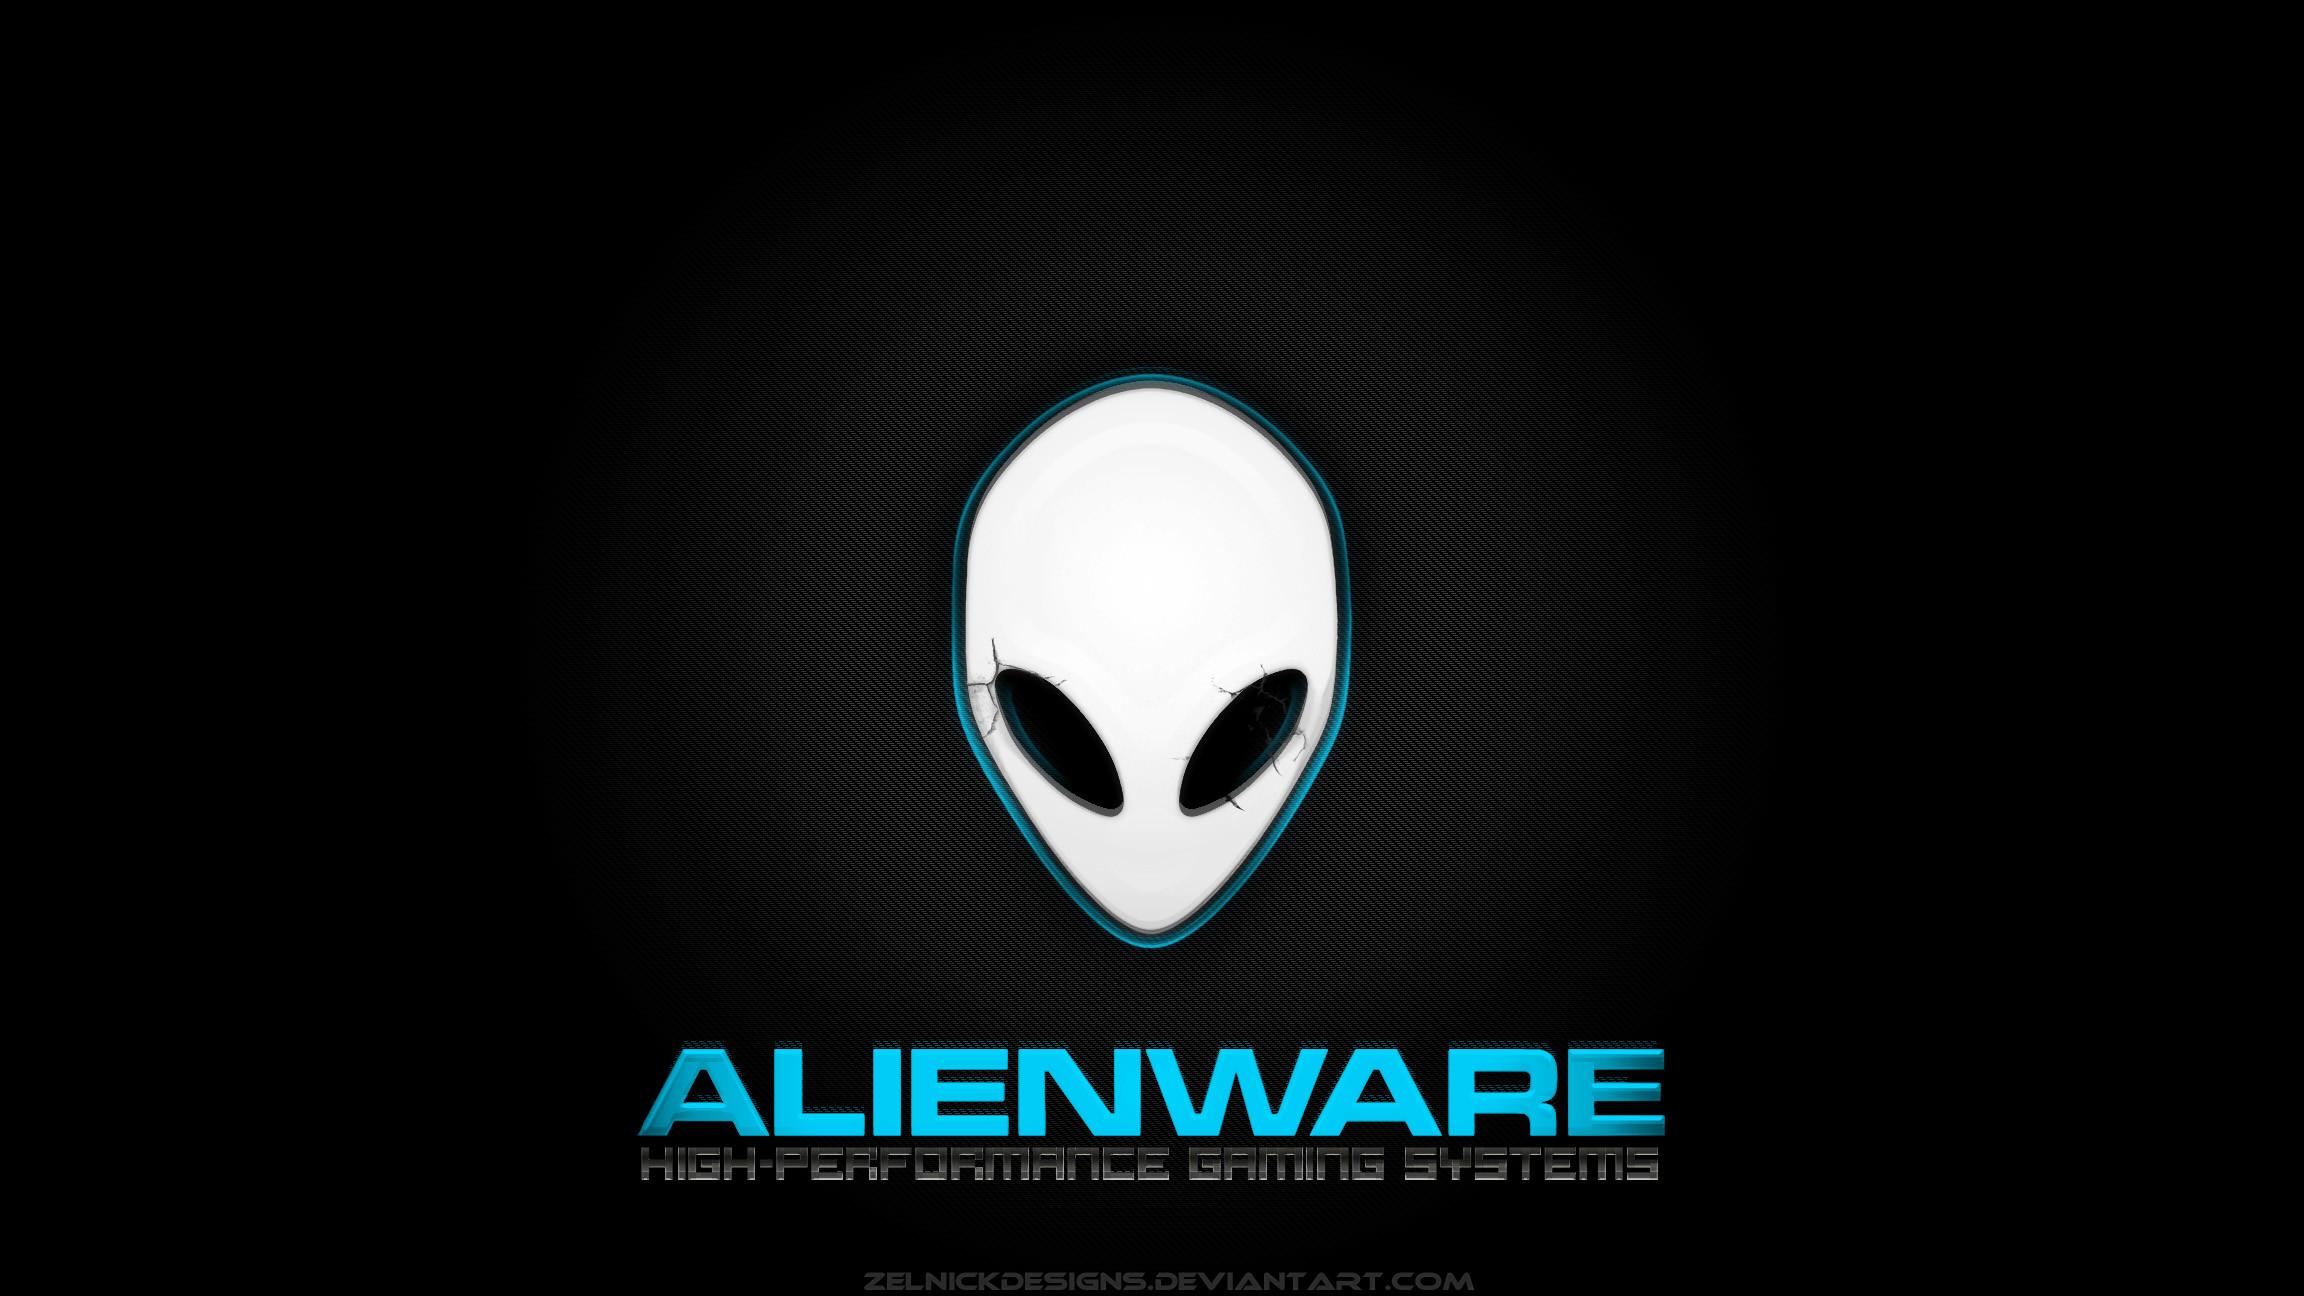 Alienware Wallpaper Pack (63+ images)